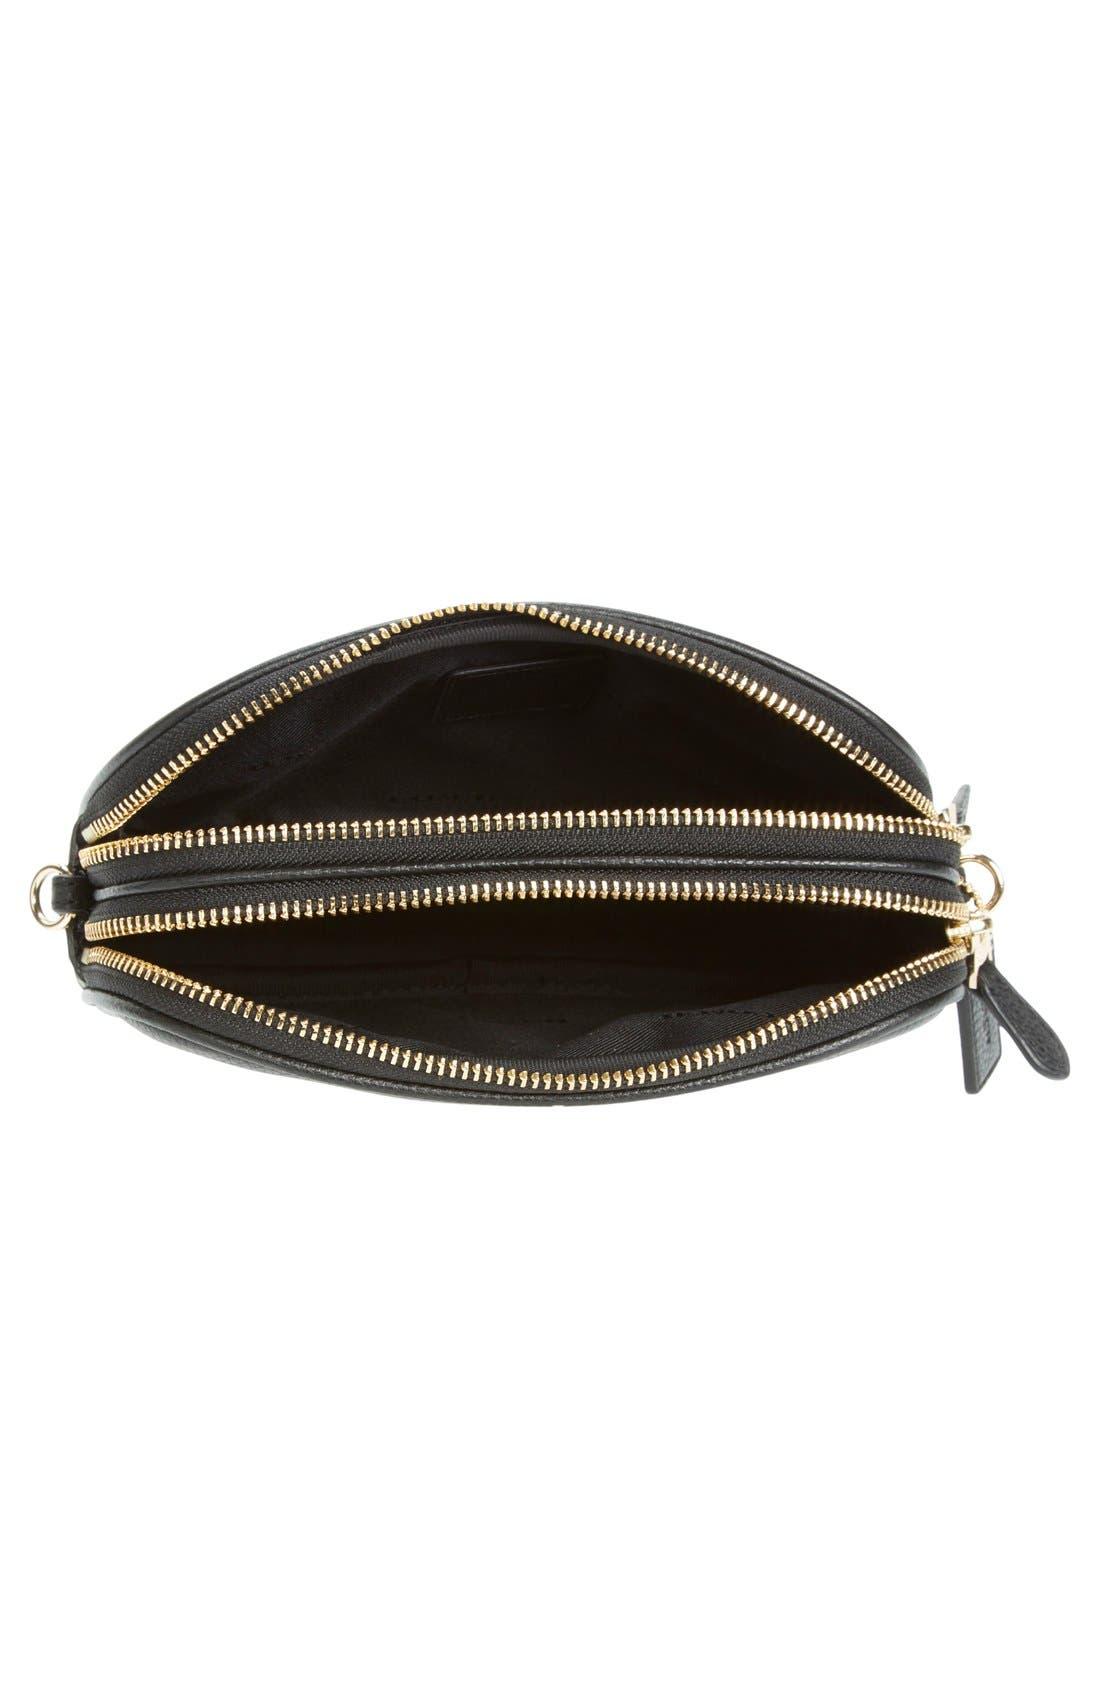 Convertible Leather Crossbody Bag,                             Alternate thumbnail 6, color,                             001